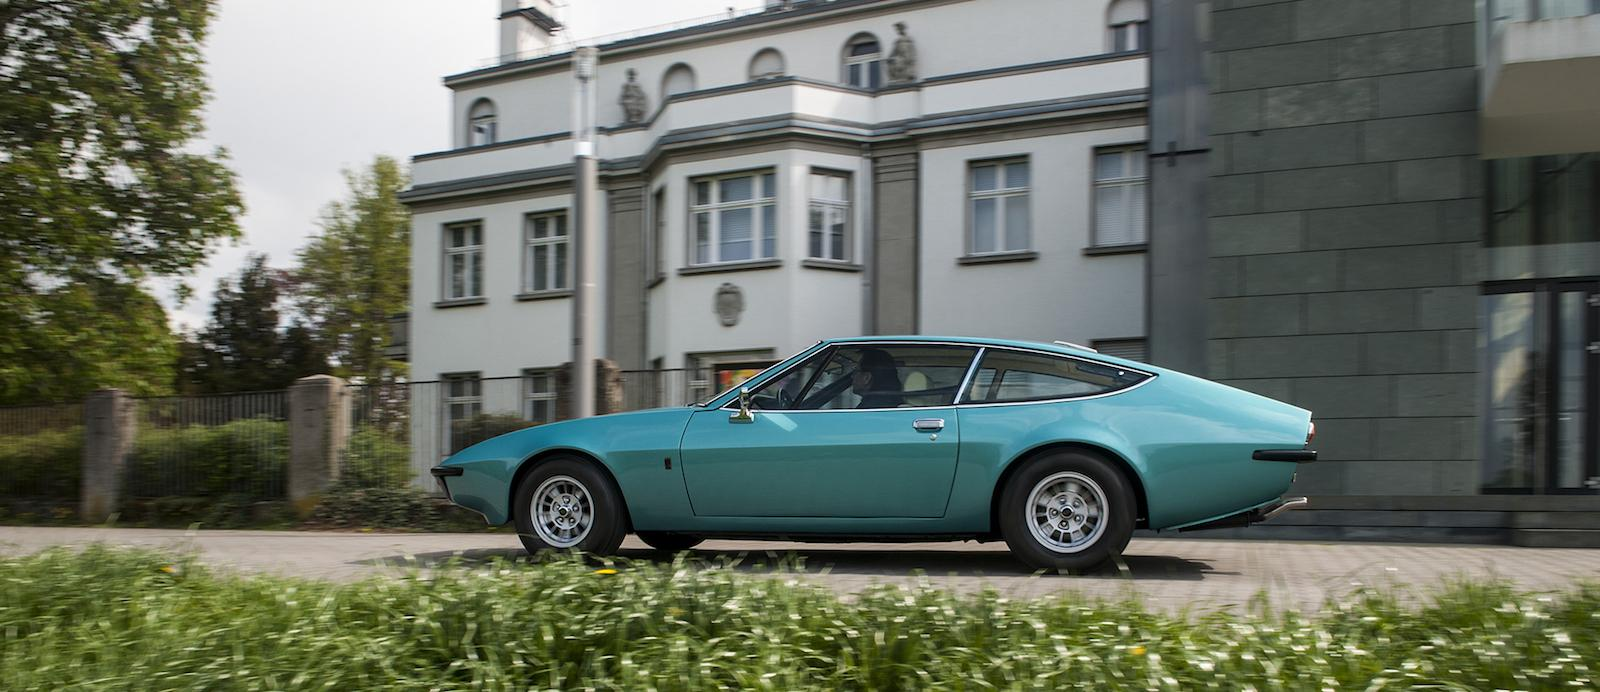 CD, SC Classic cars for sale | Autoclassics.com